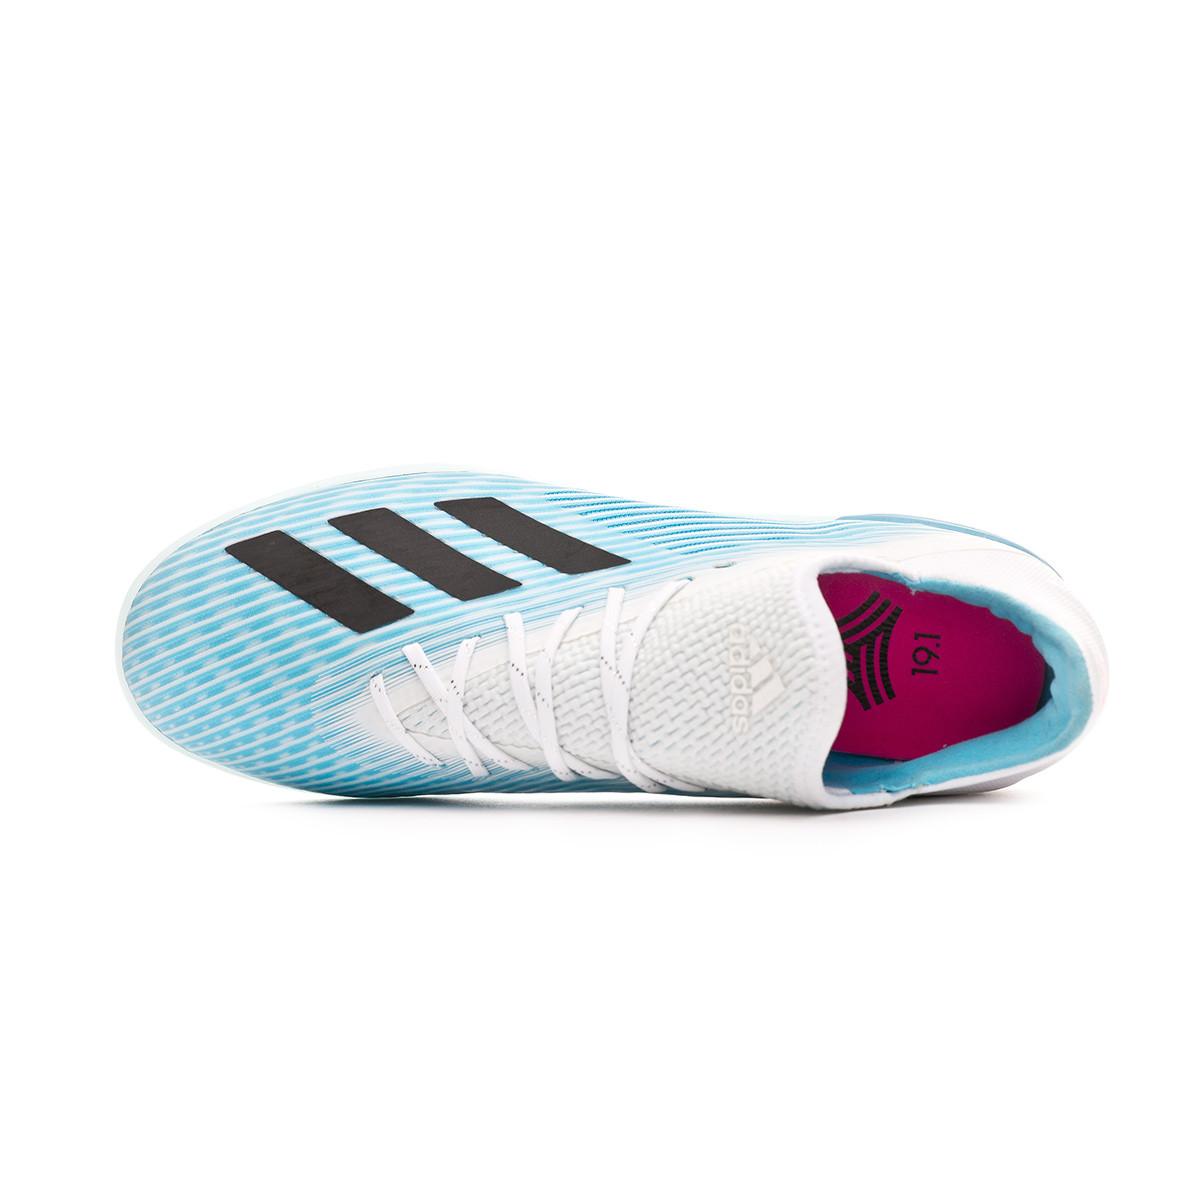 Chaussure de futsal adidas X 19.1 IN Bright cyan Core black